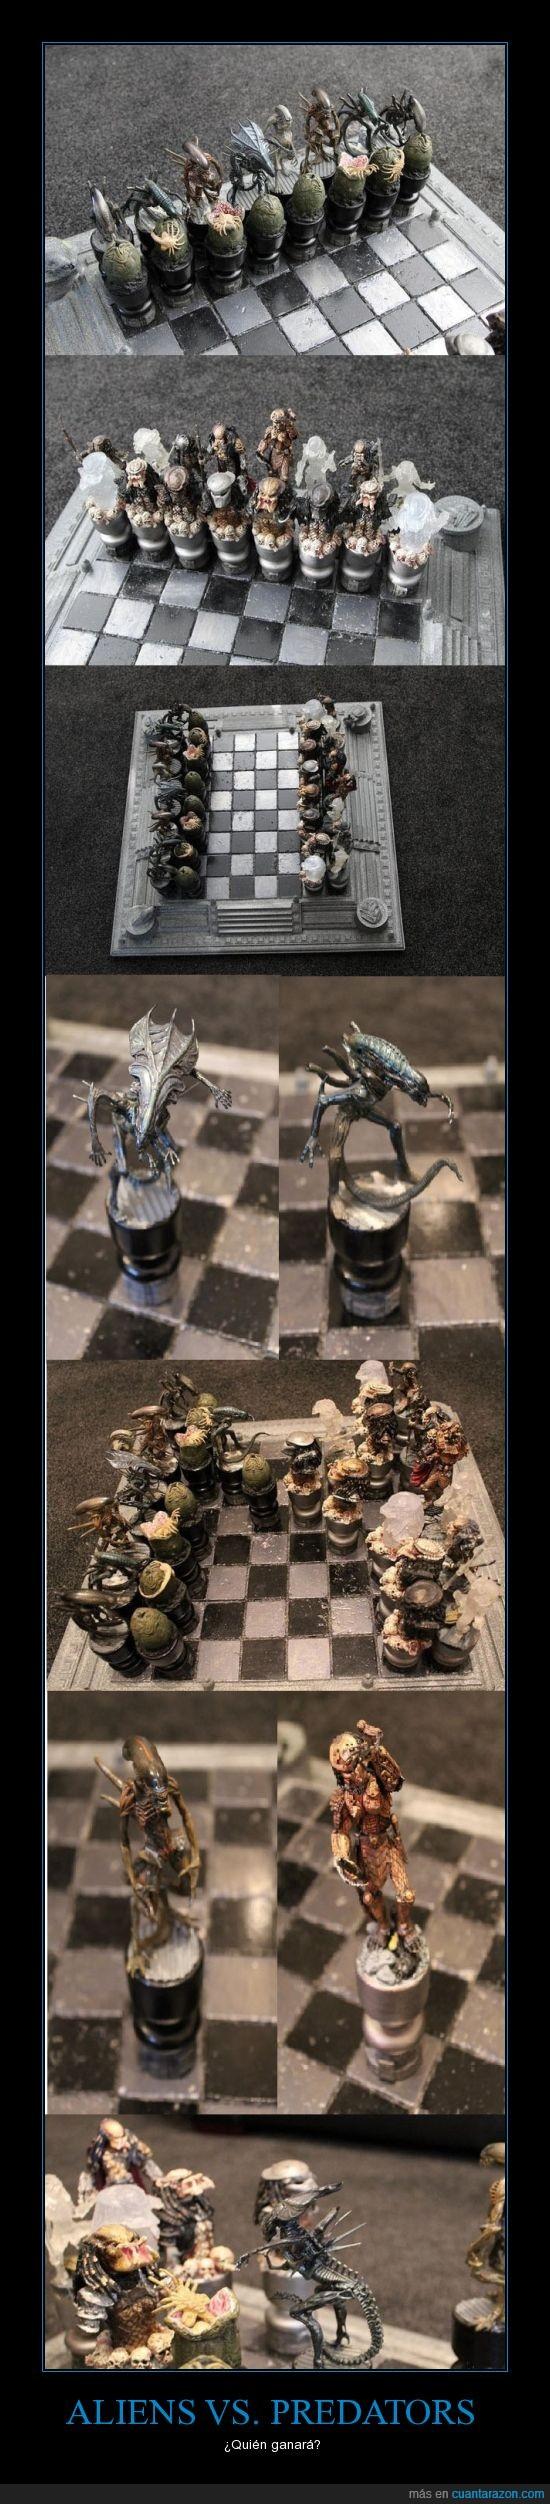 ajedrez,aliens,juego,mola,predator